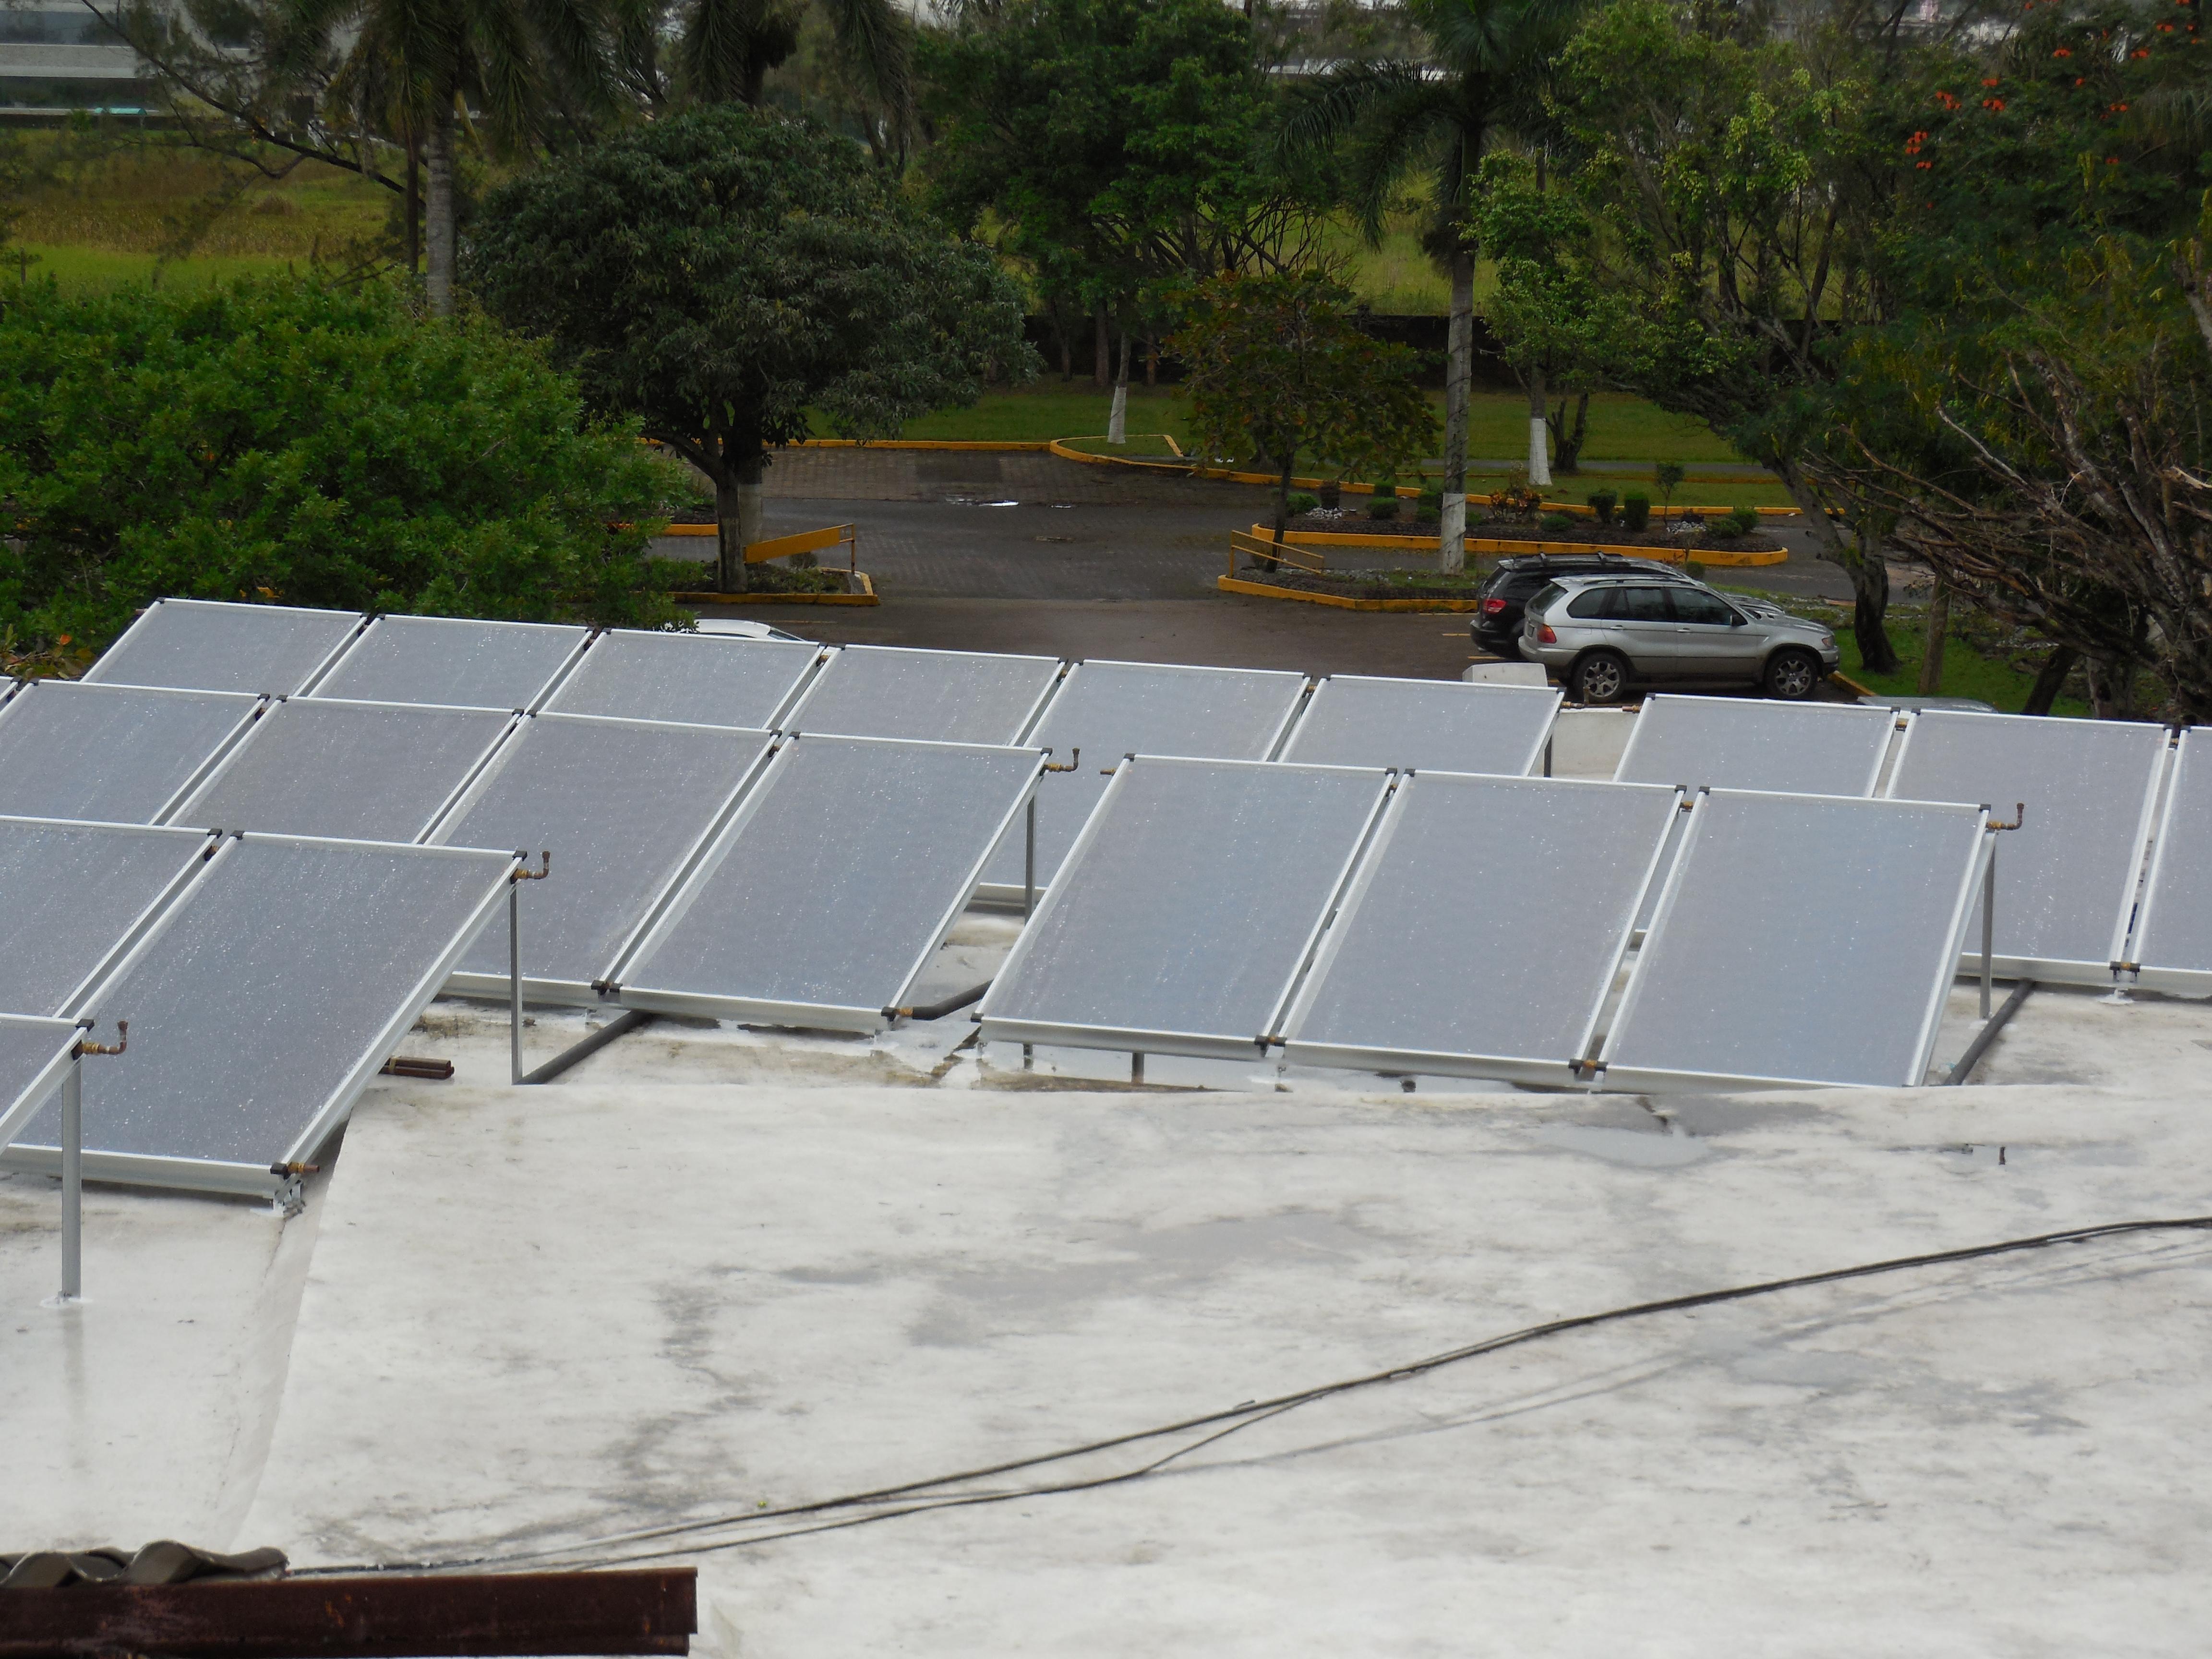 https://0201.nccdn.net/4_2/000/000/046/6ea/10000-Litros.-Regaderas--Hotel-Terranova.-Coatzacoalcos-en-Veracruz-1-4608x3456.jpg